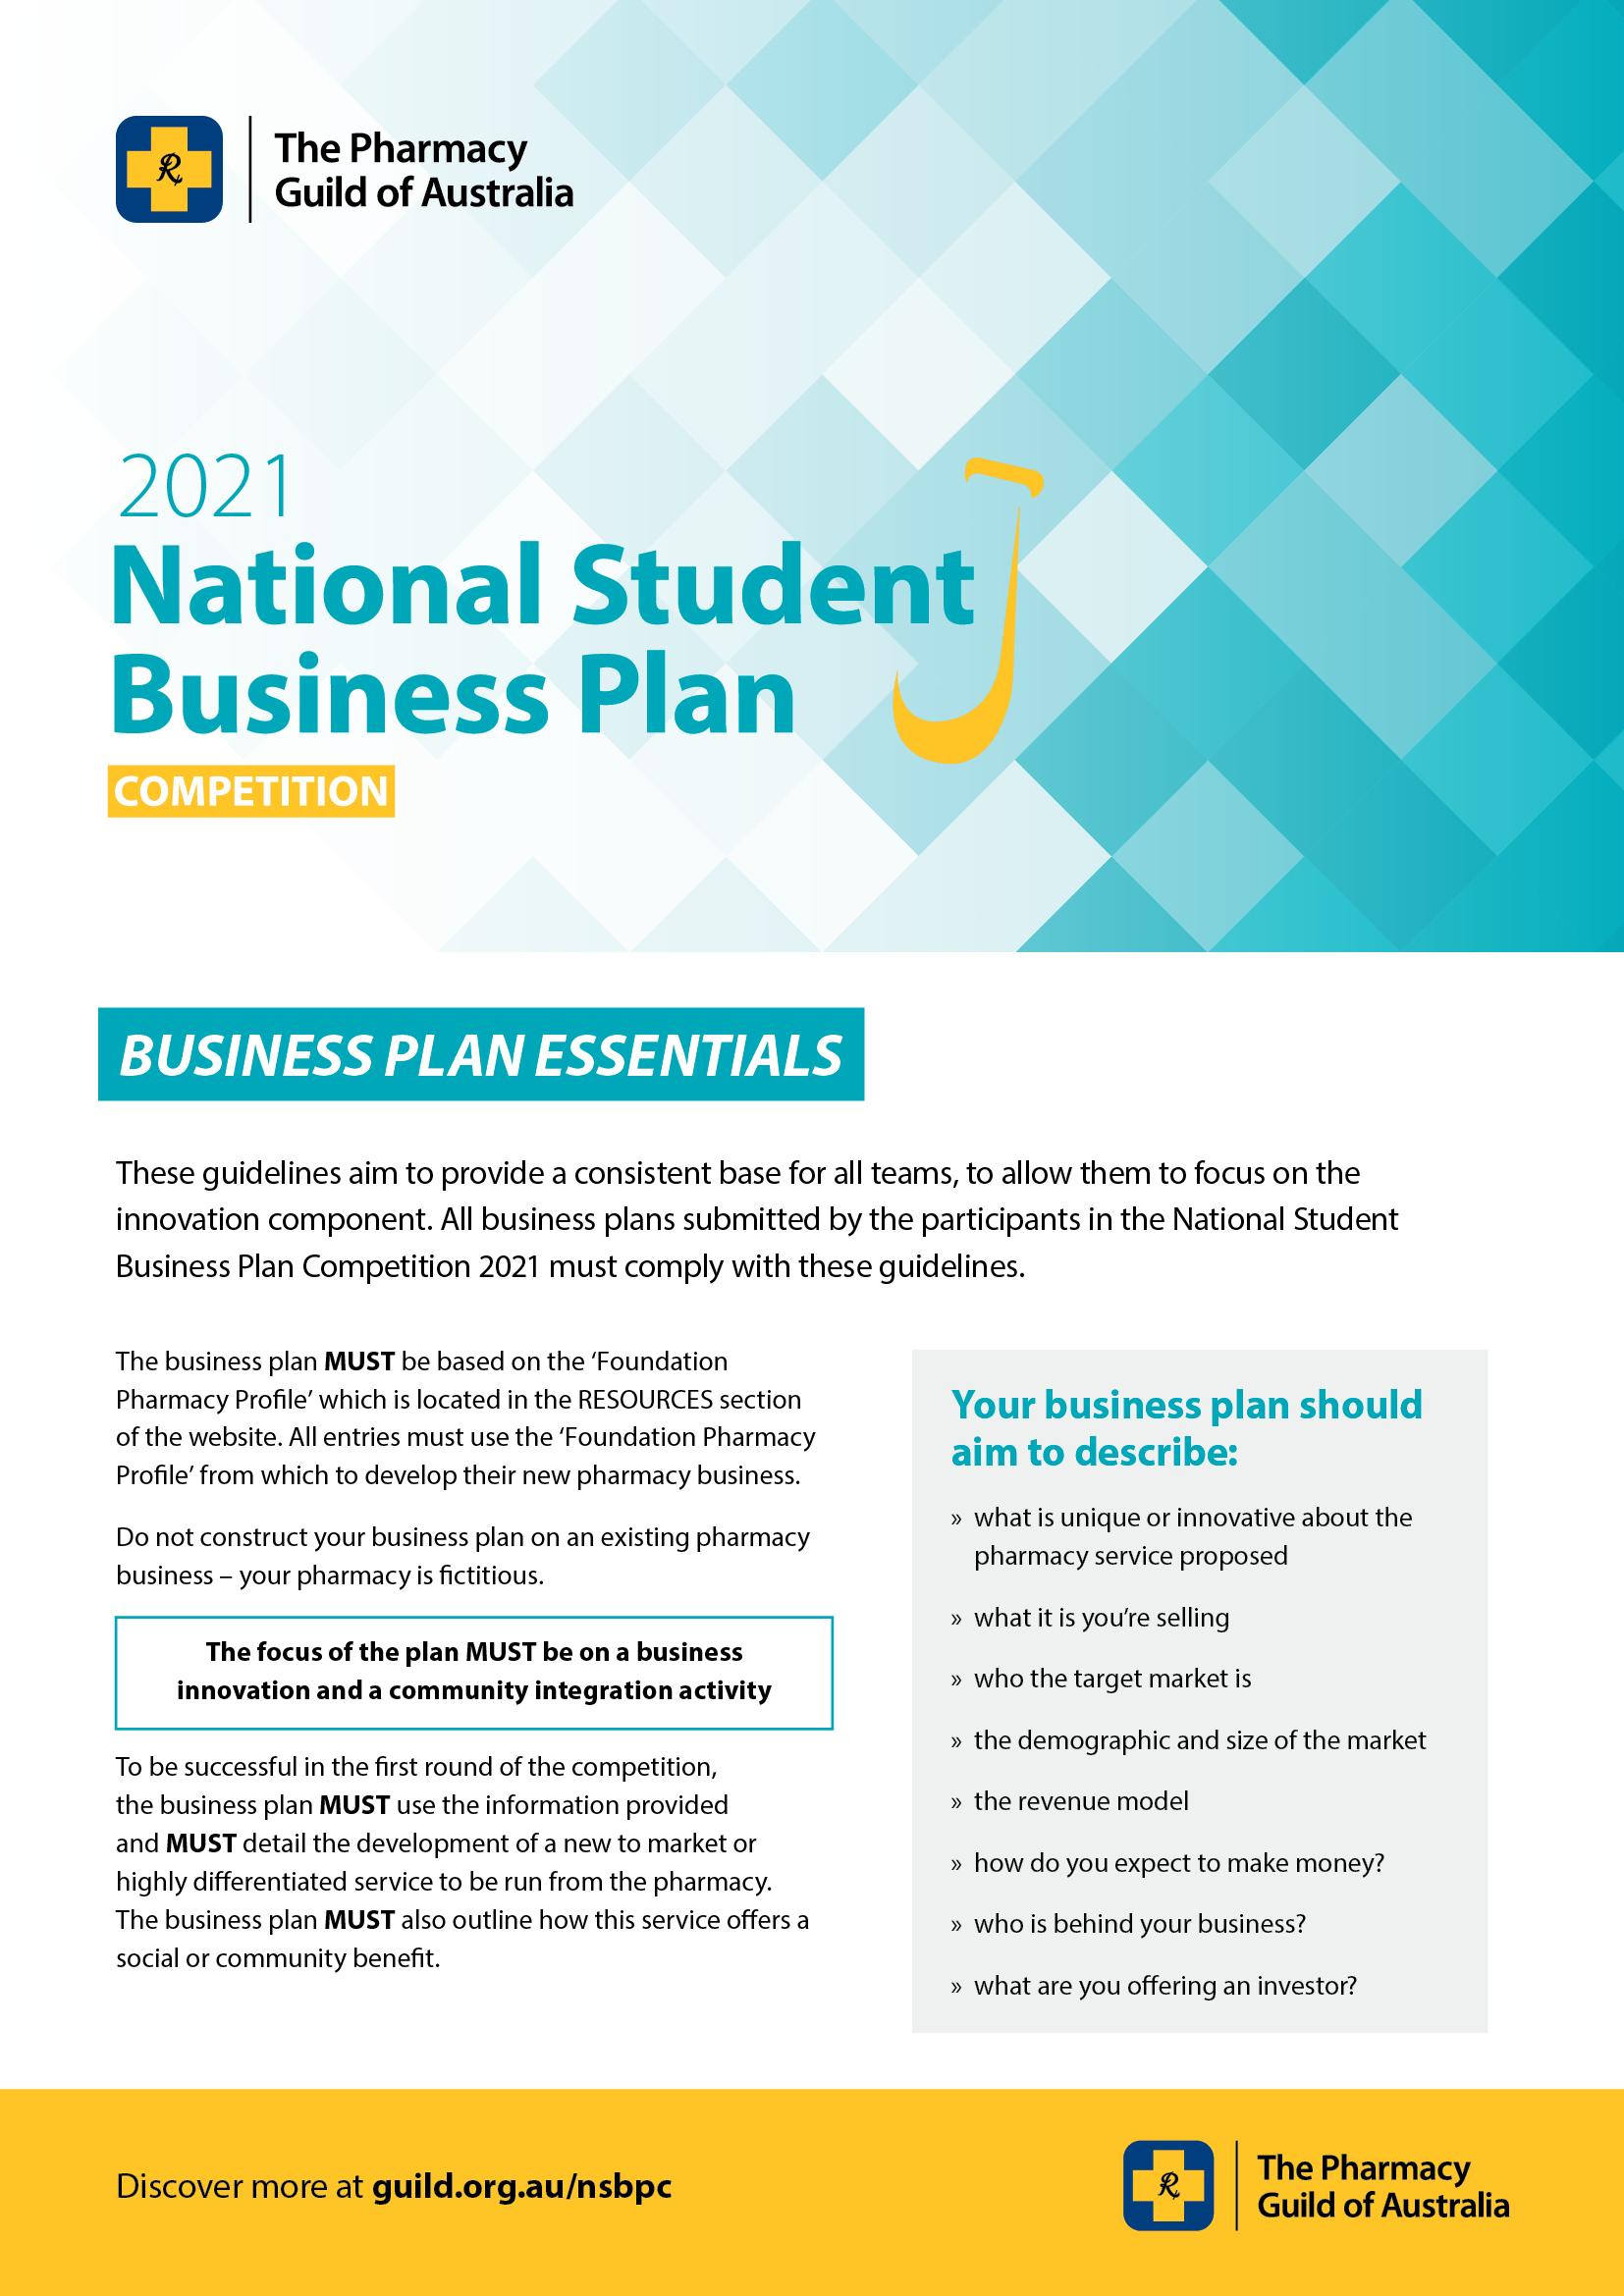 NSBPC 2021 Business Plan checklist image